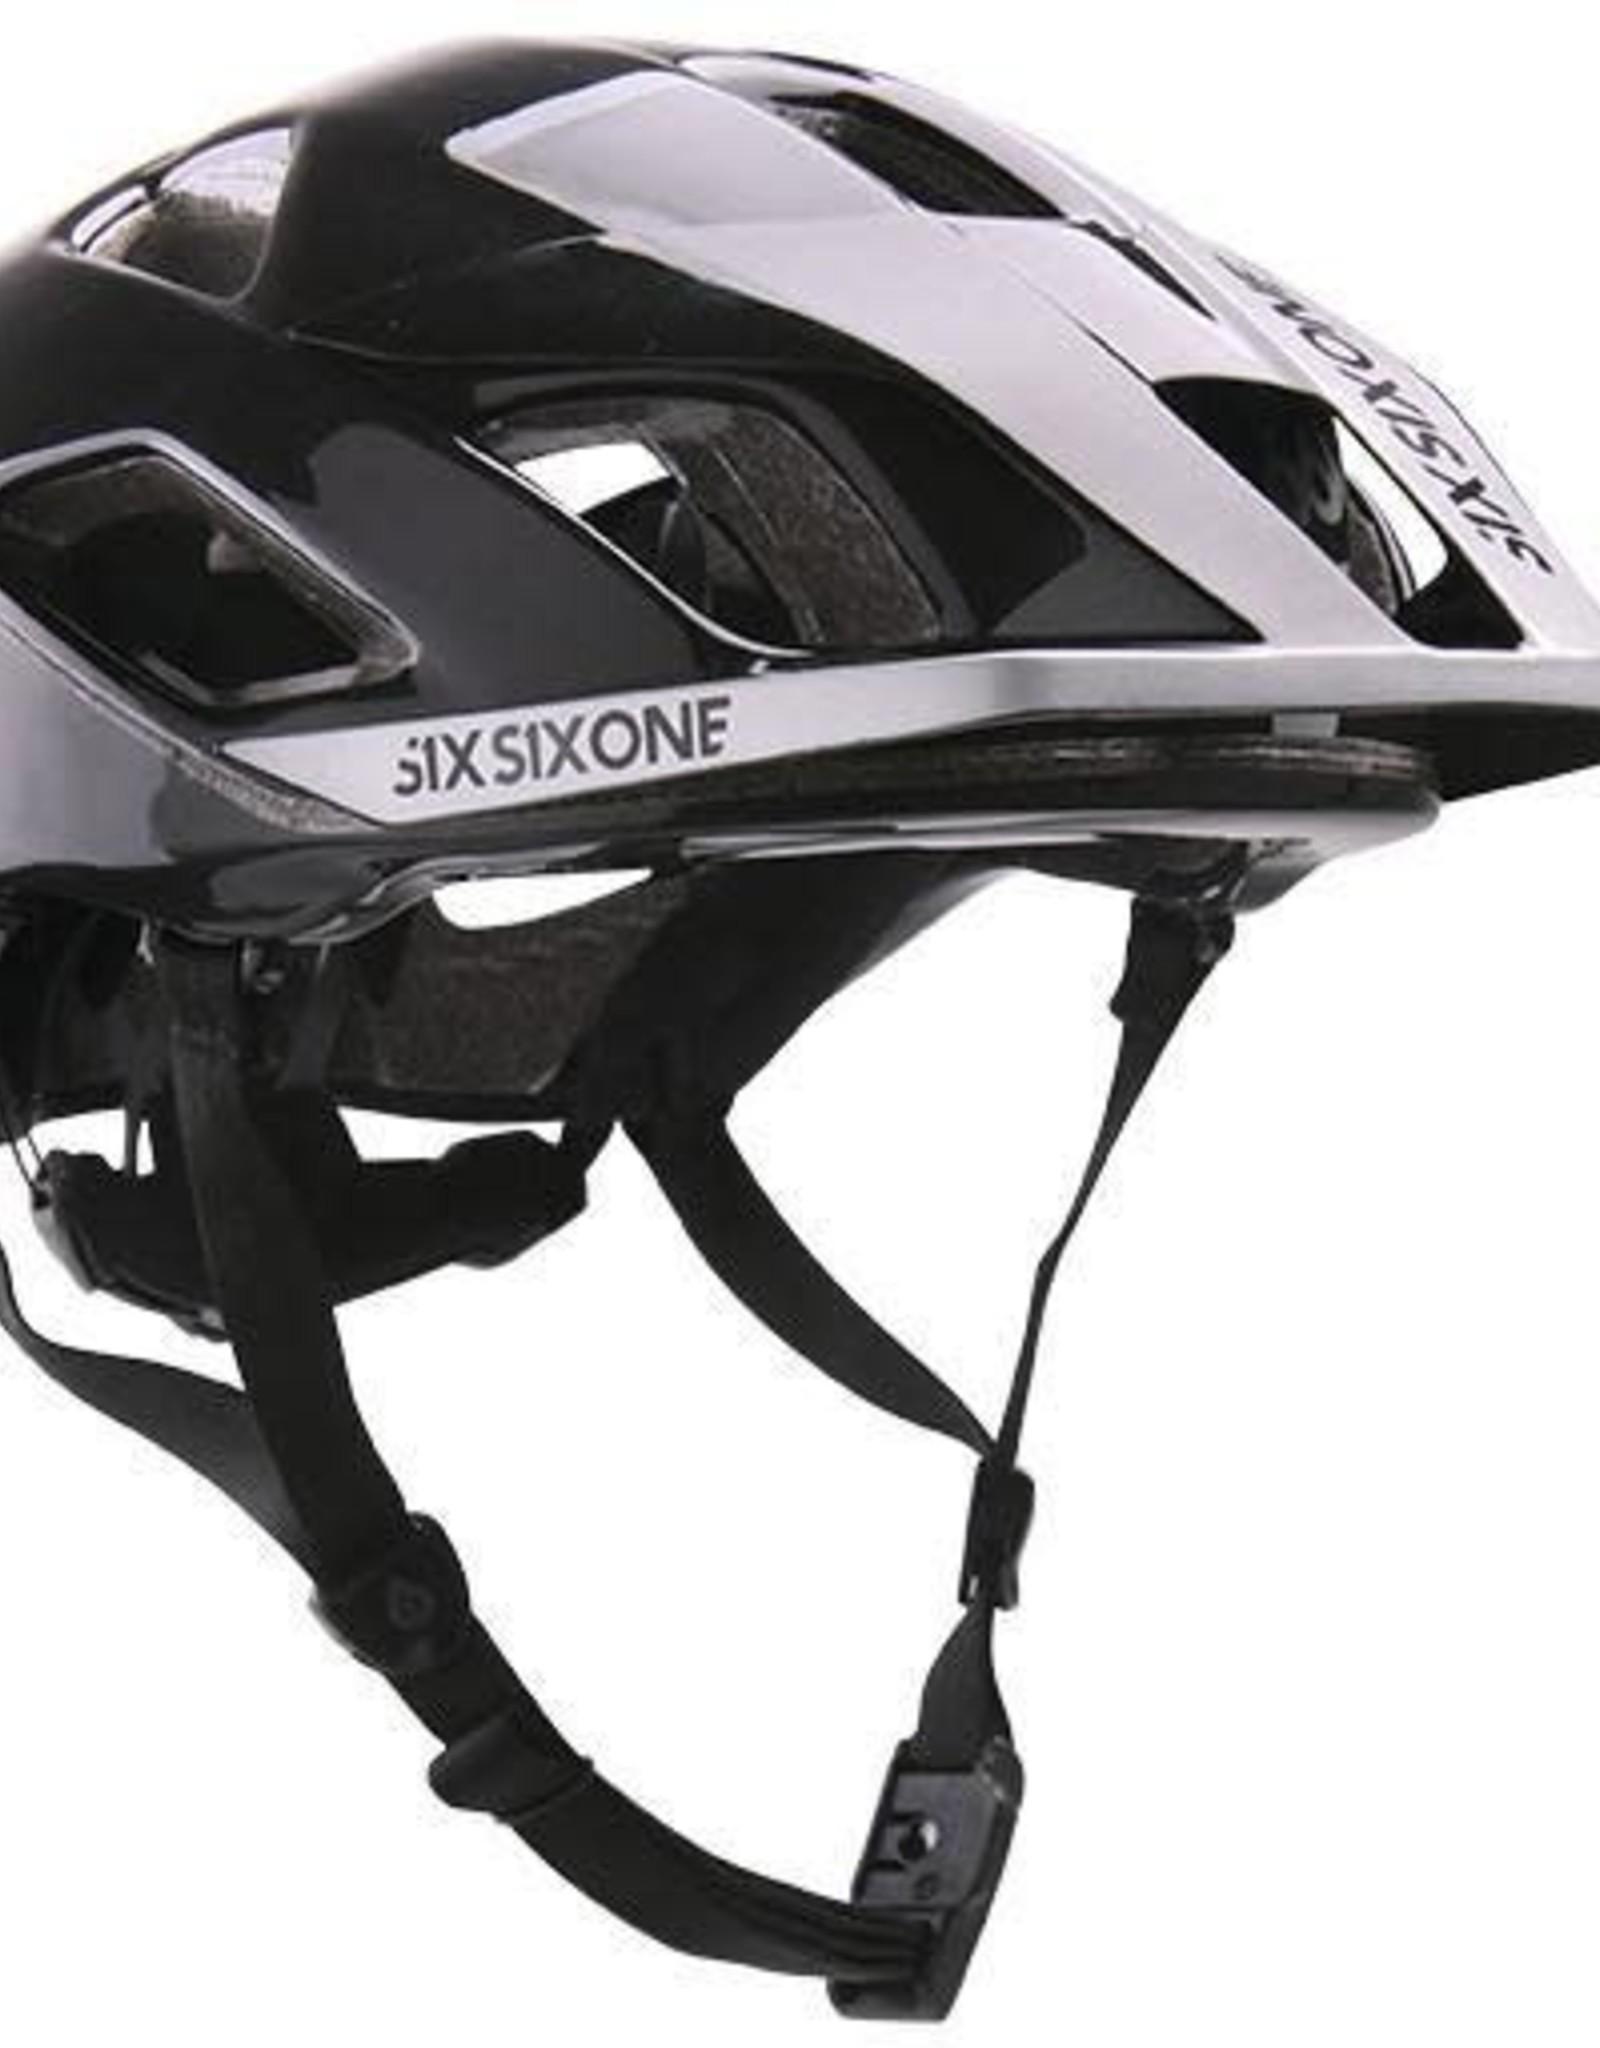 SIXSIXONE 661 EVO AM HELMET WITH MIPS